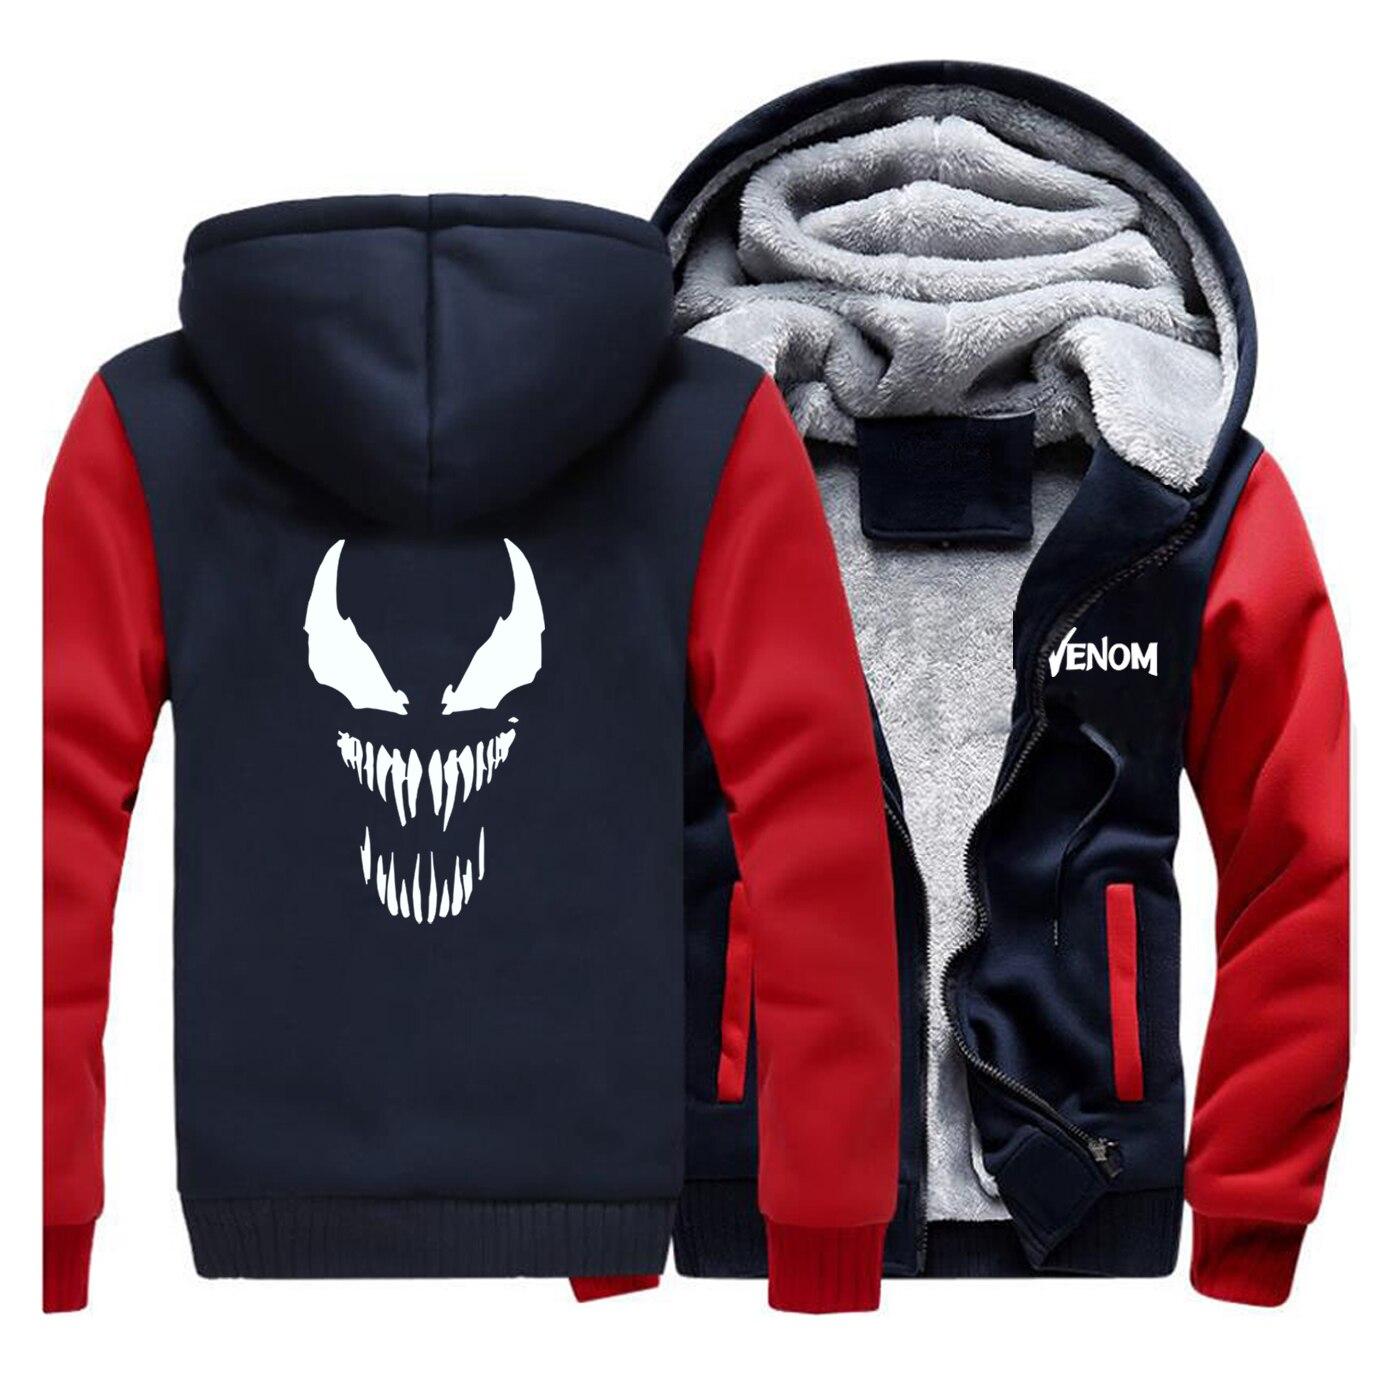 Venom Anime Print Coat Men's Fleece Warm Jacket 2019 Autumn Winter Fleece Funny Male Hoodies Sweatshirts Brand Men Streetwear